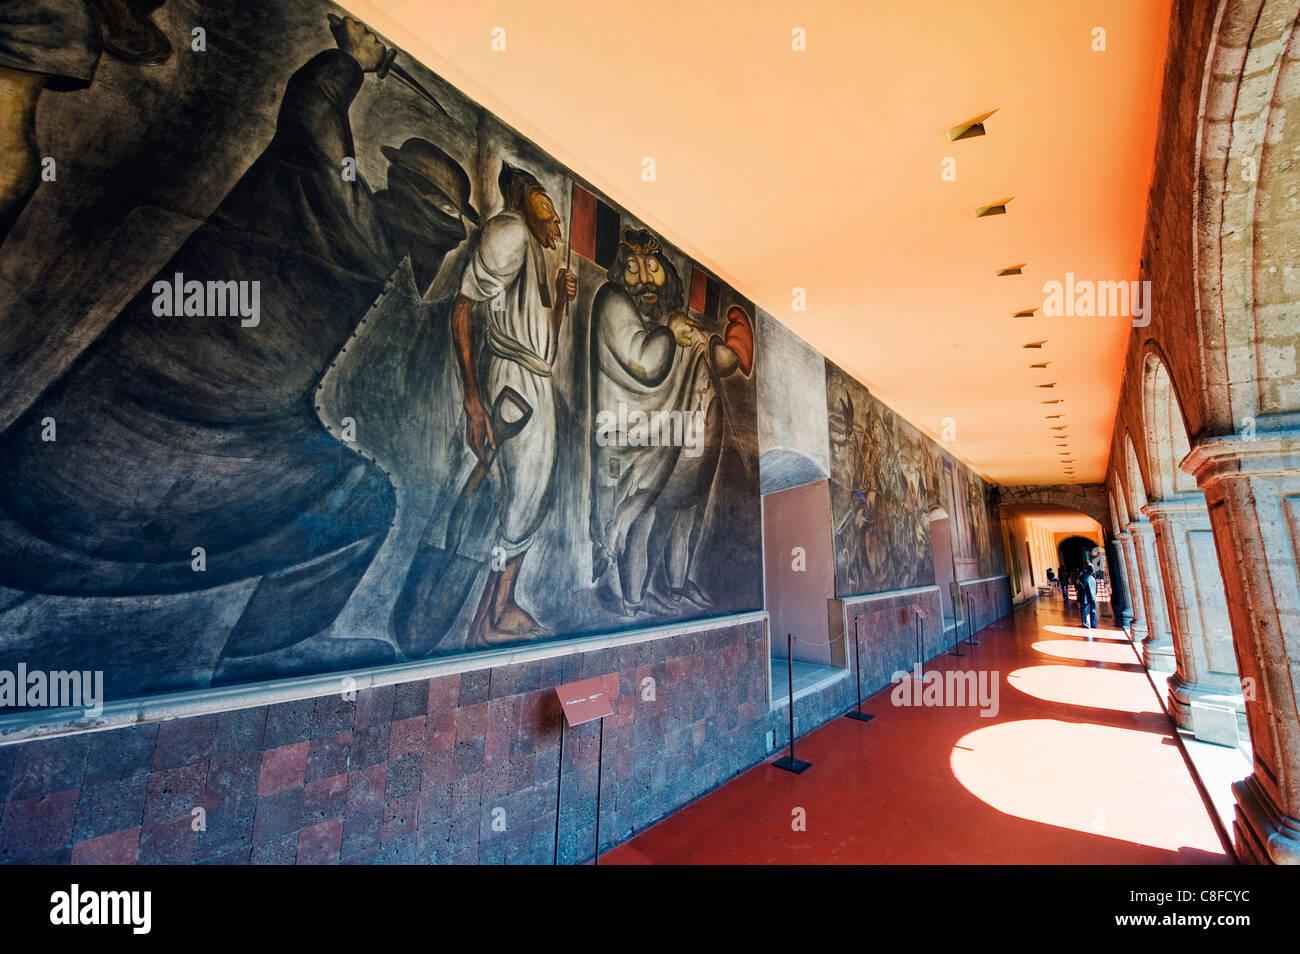 Murals at Antiguo Colegio de San Ildefonso, District Federal, Mexico City, Mexico - Stock Image